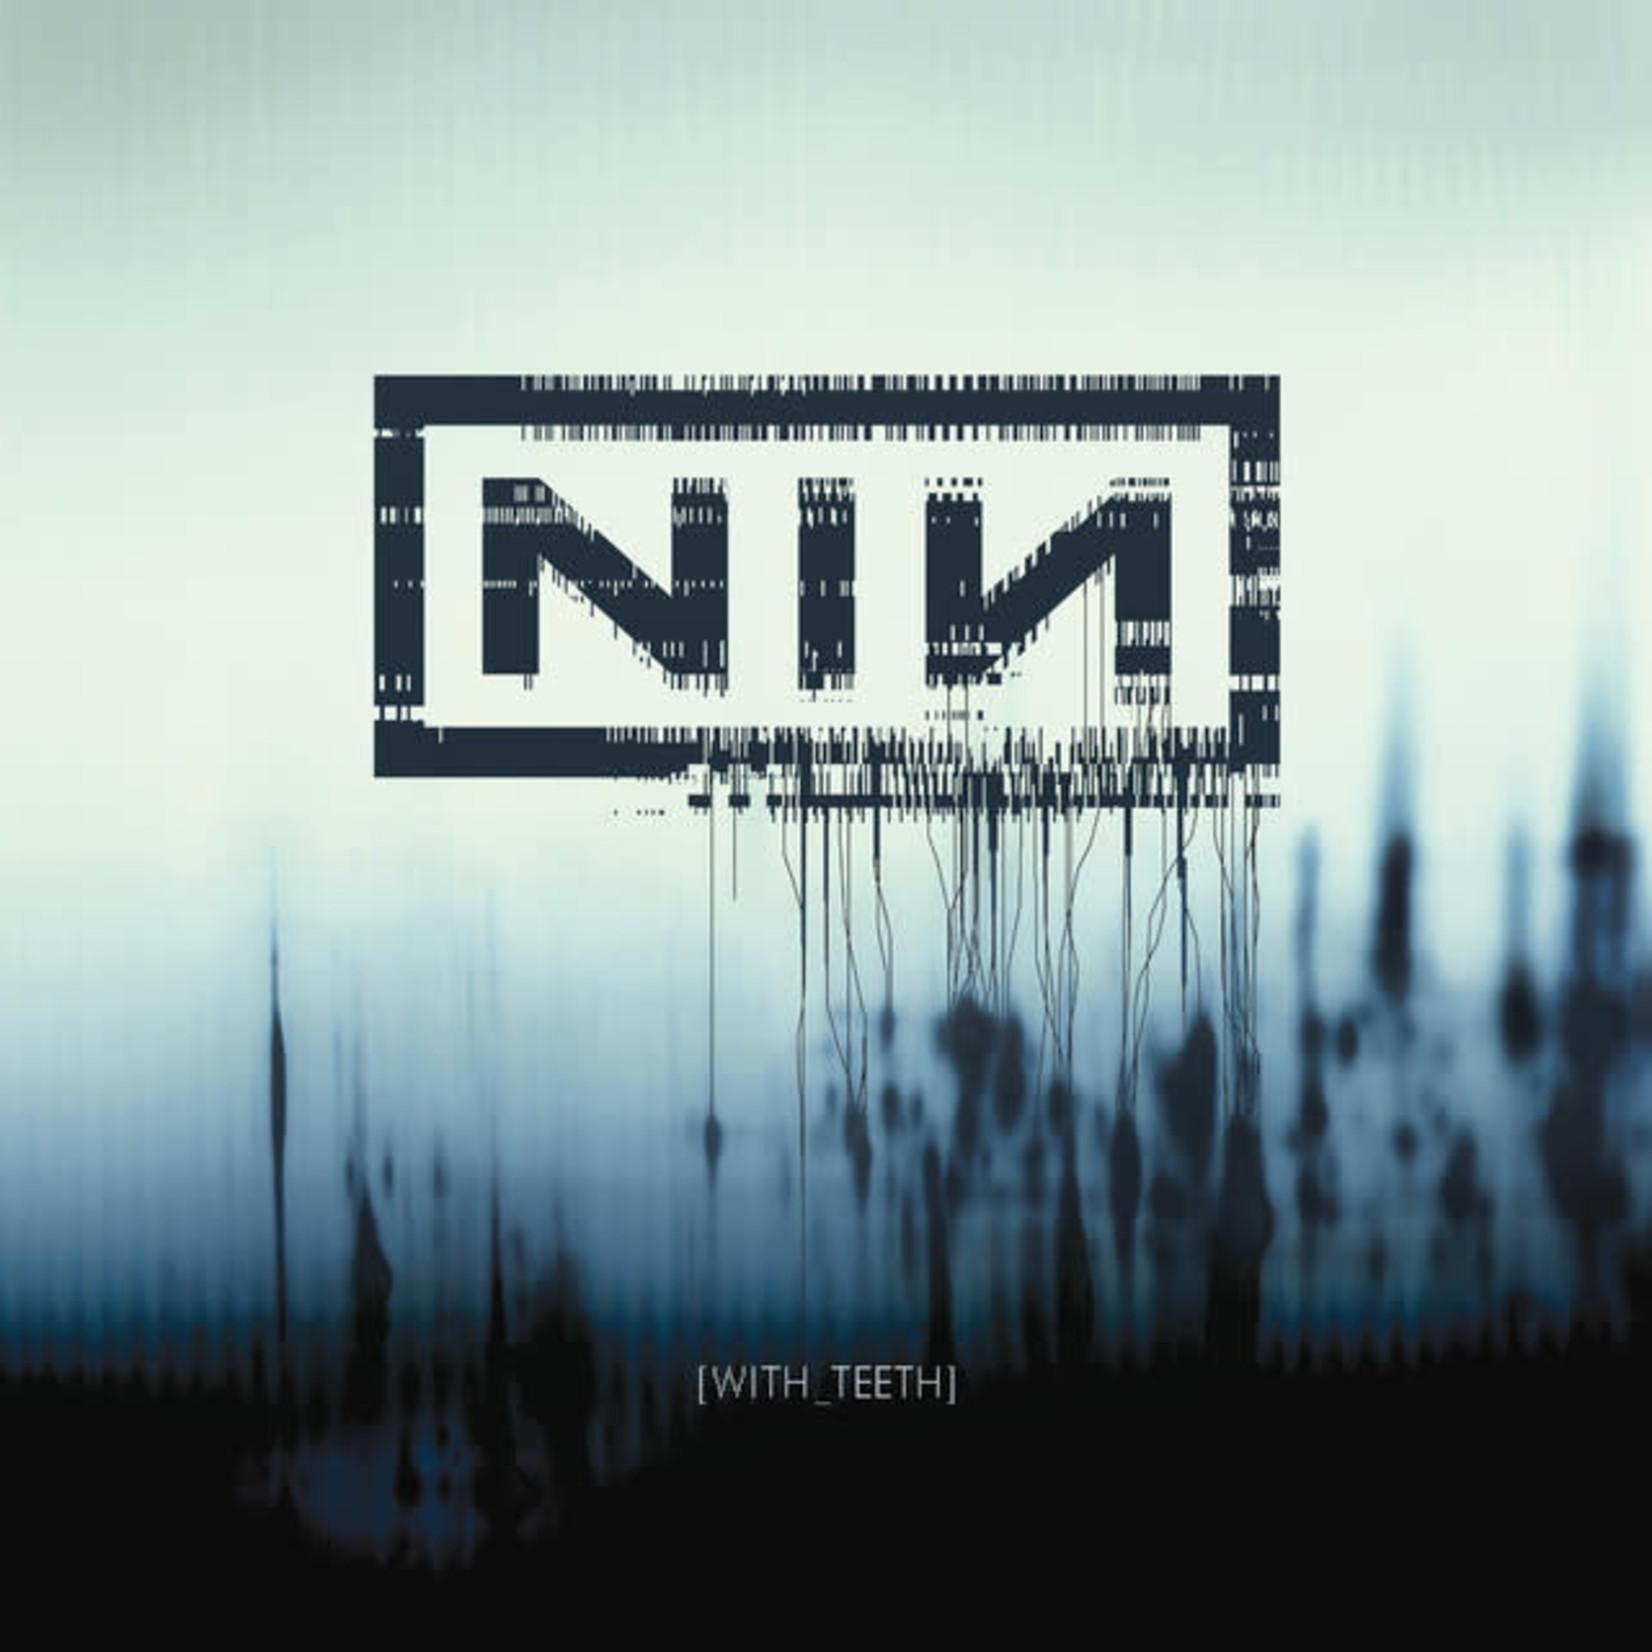 Vinyl Nine Inch Nails - With Teeth